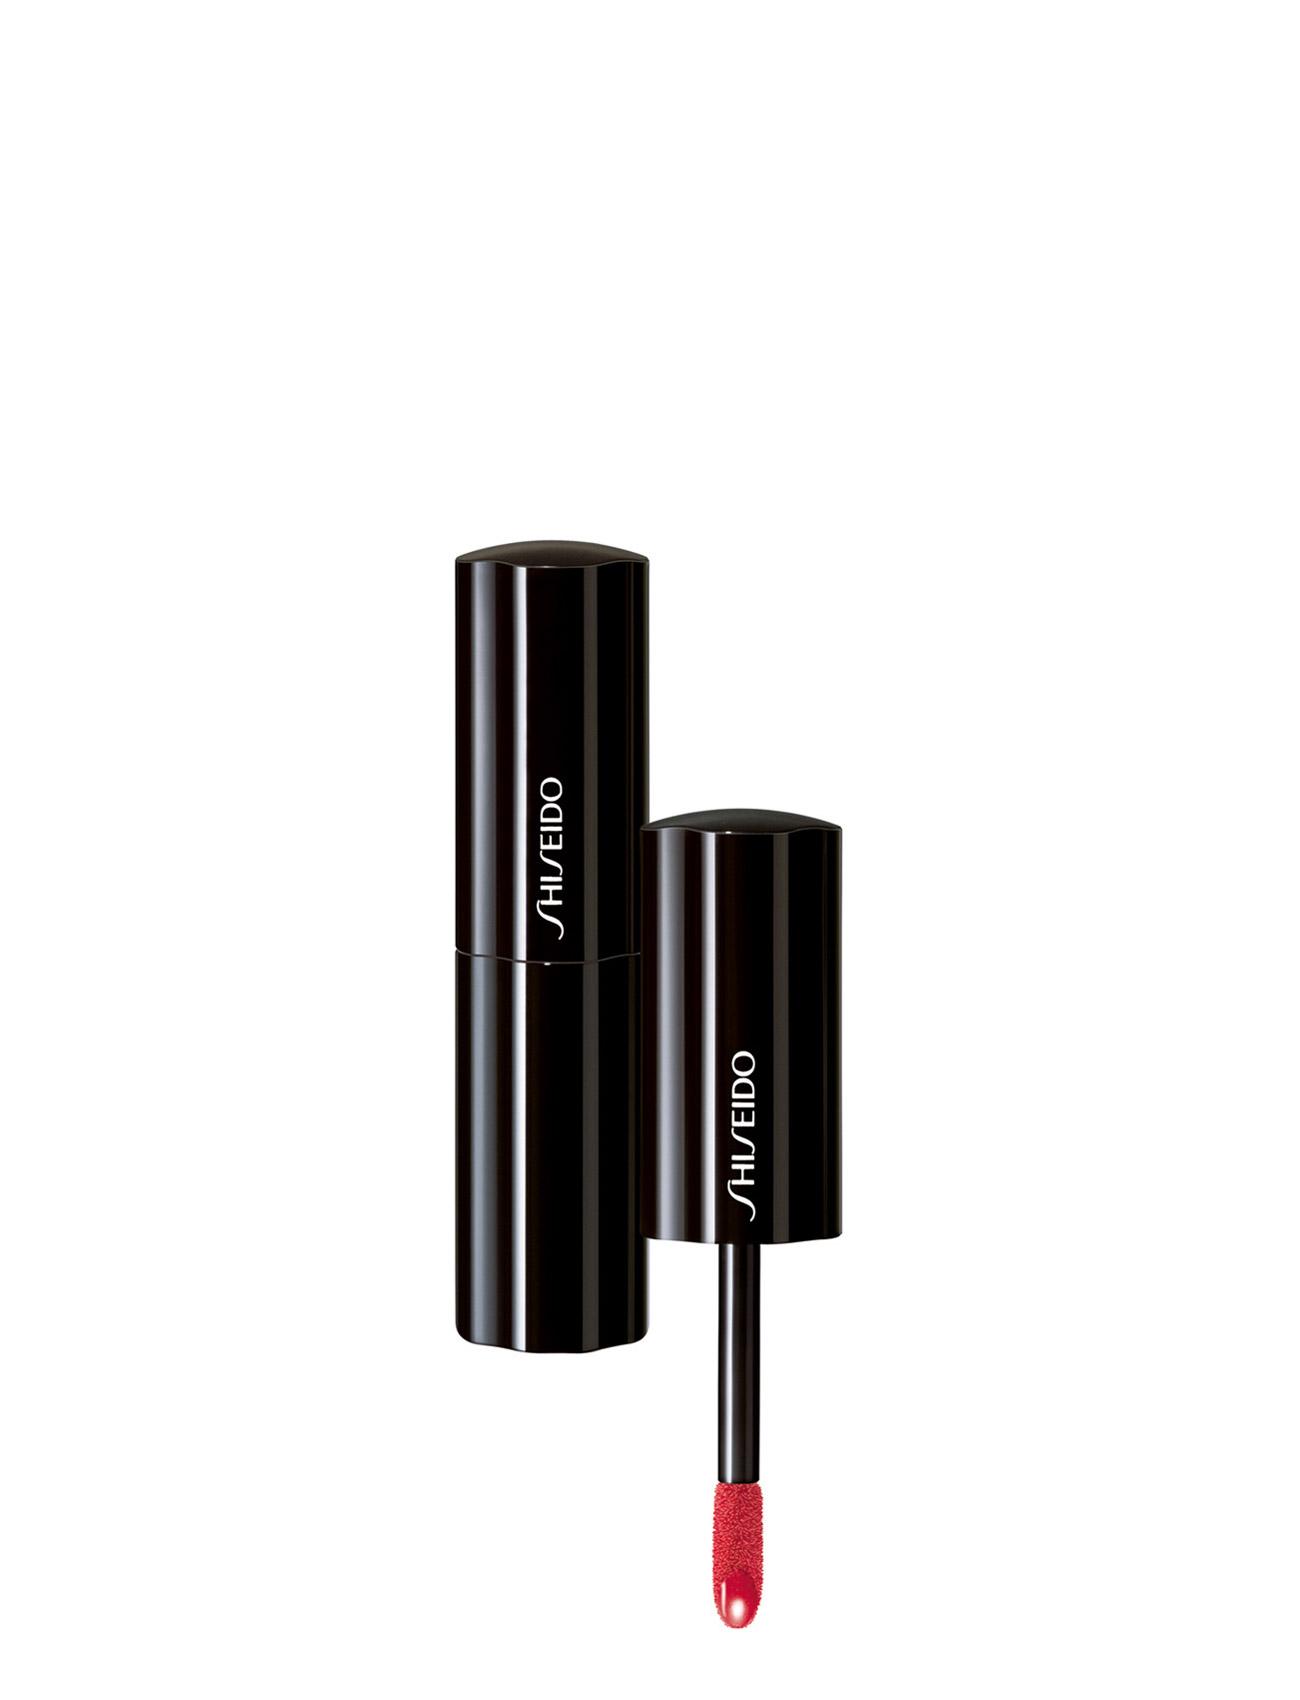 shiseido – Shiseido lacquer rouge rs322 metalr på boozt.com dk